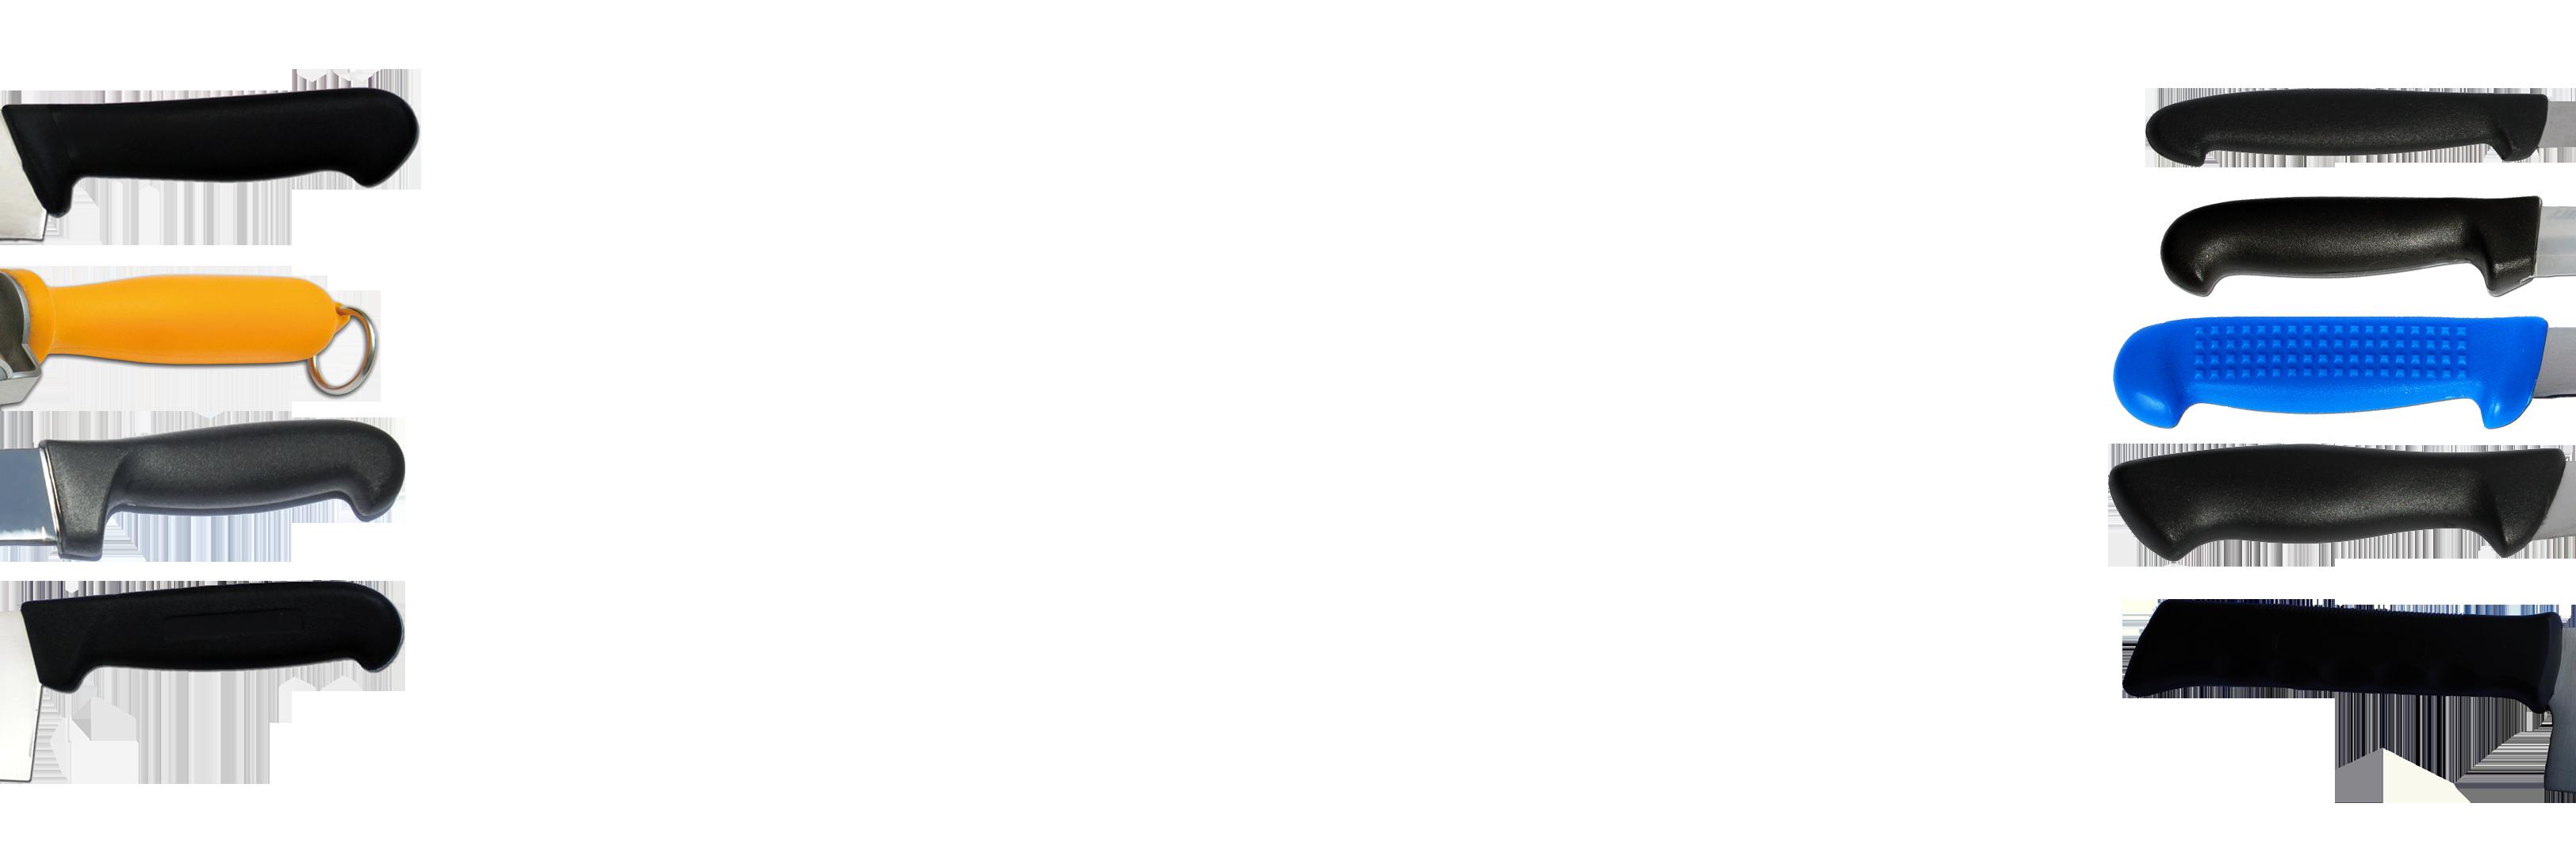 polypropylene-pp-handle.png